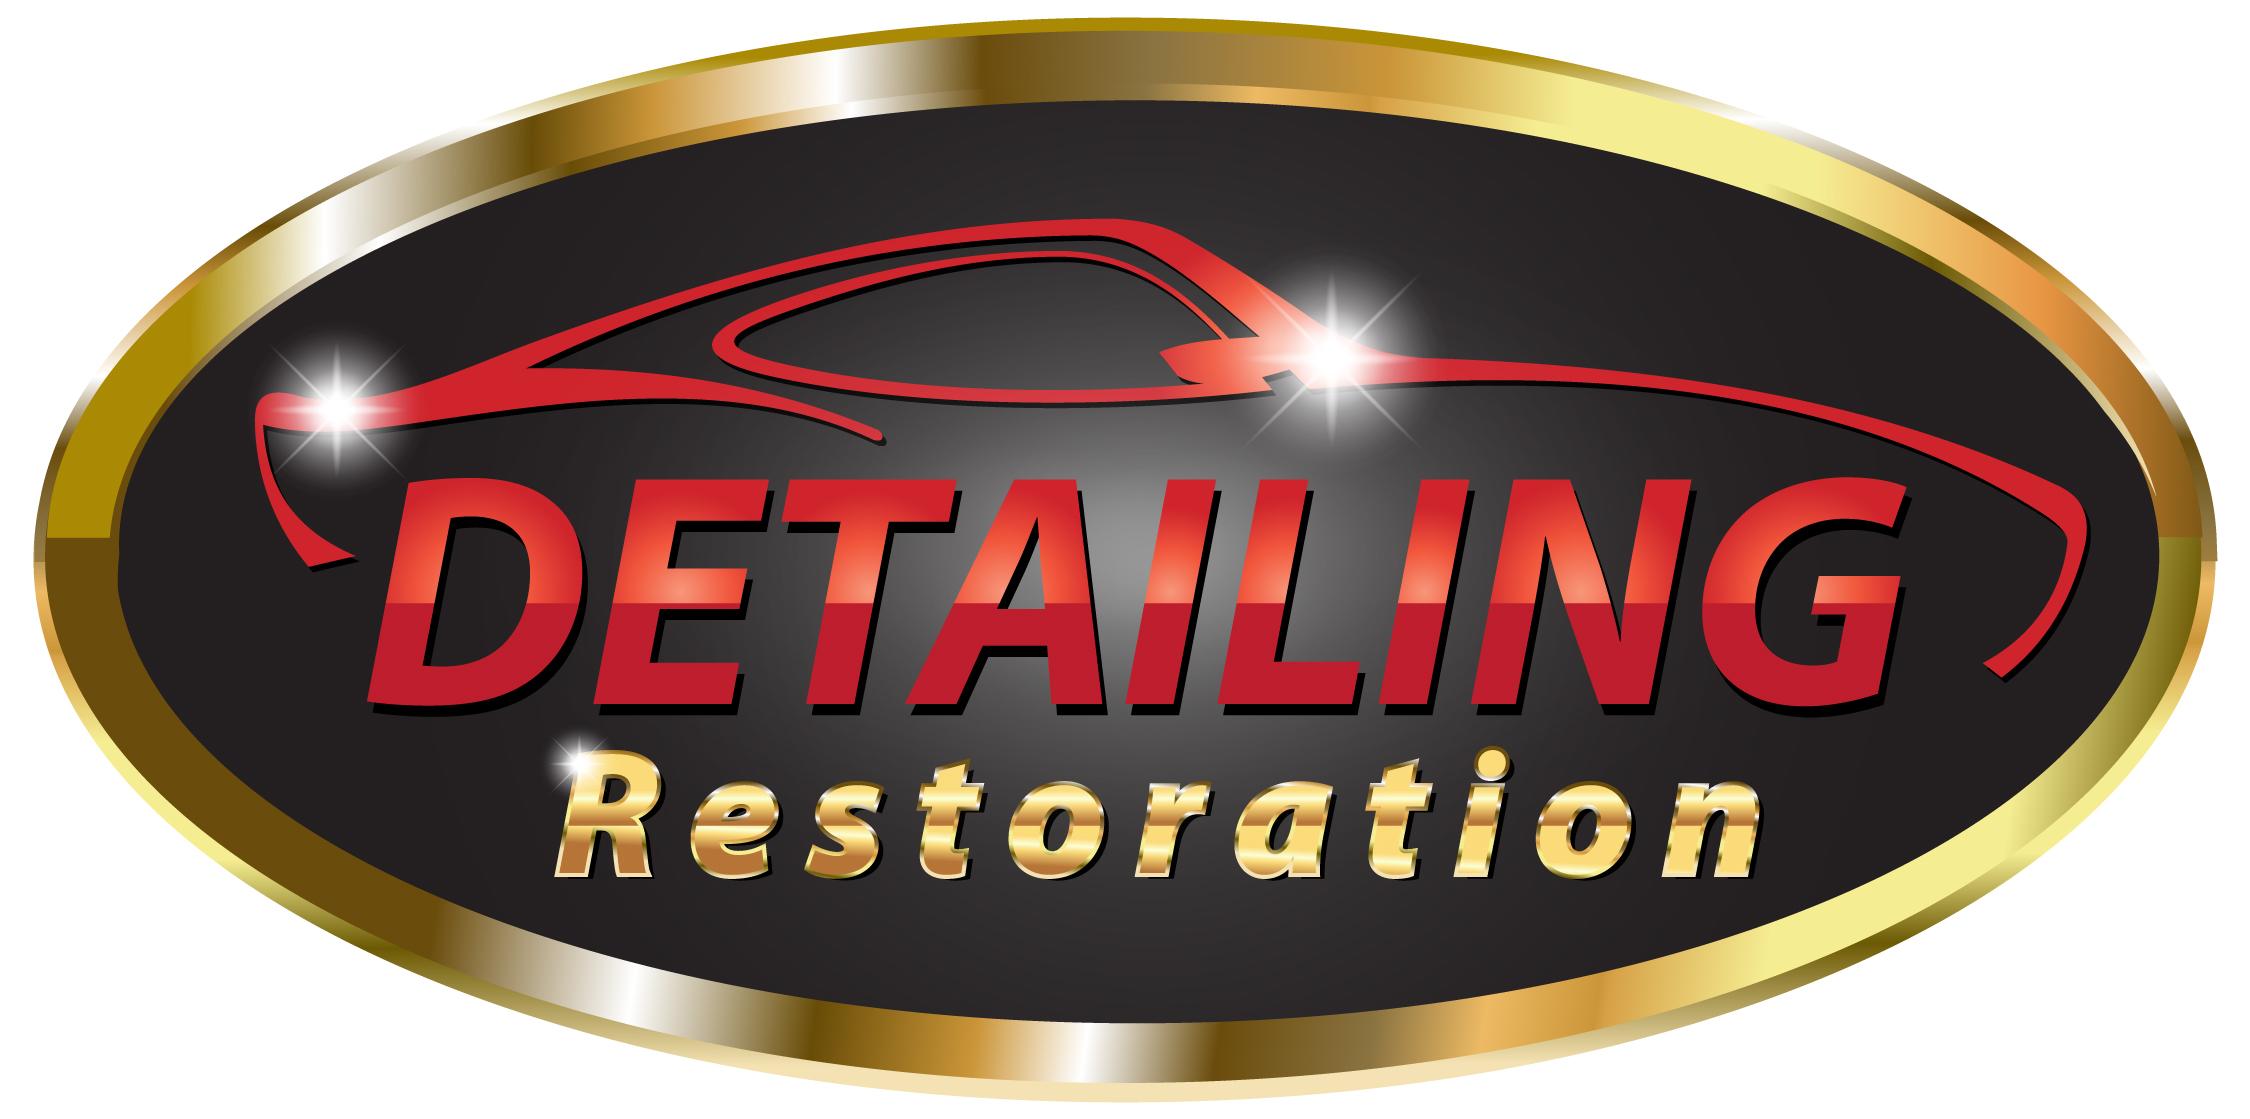 Detailing Restoration is the Go-To Car Detailing Shop